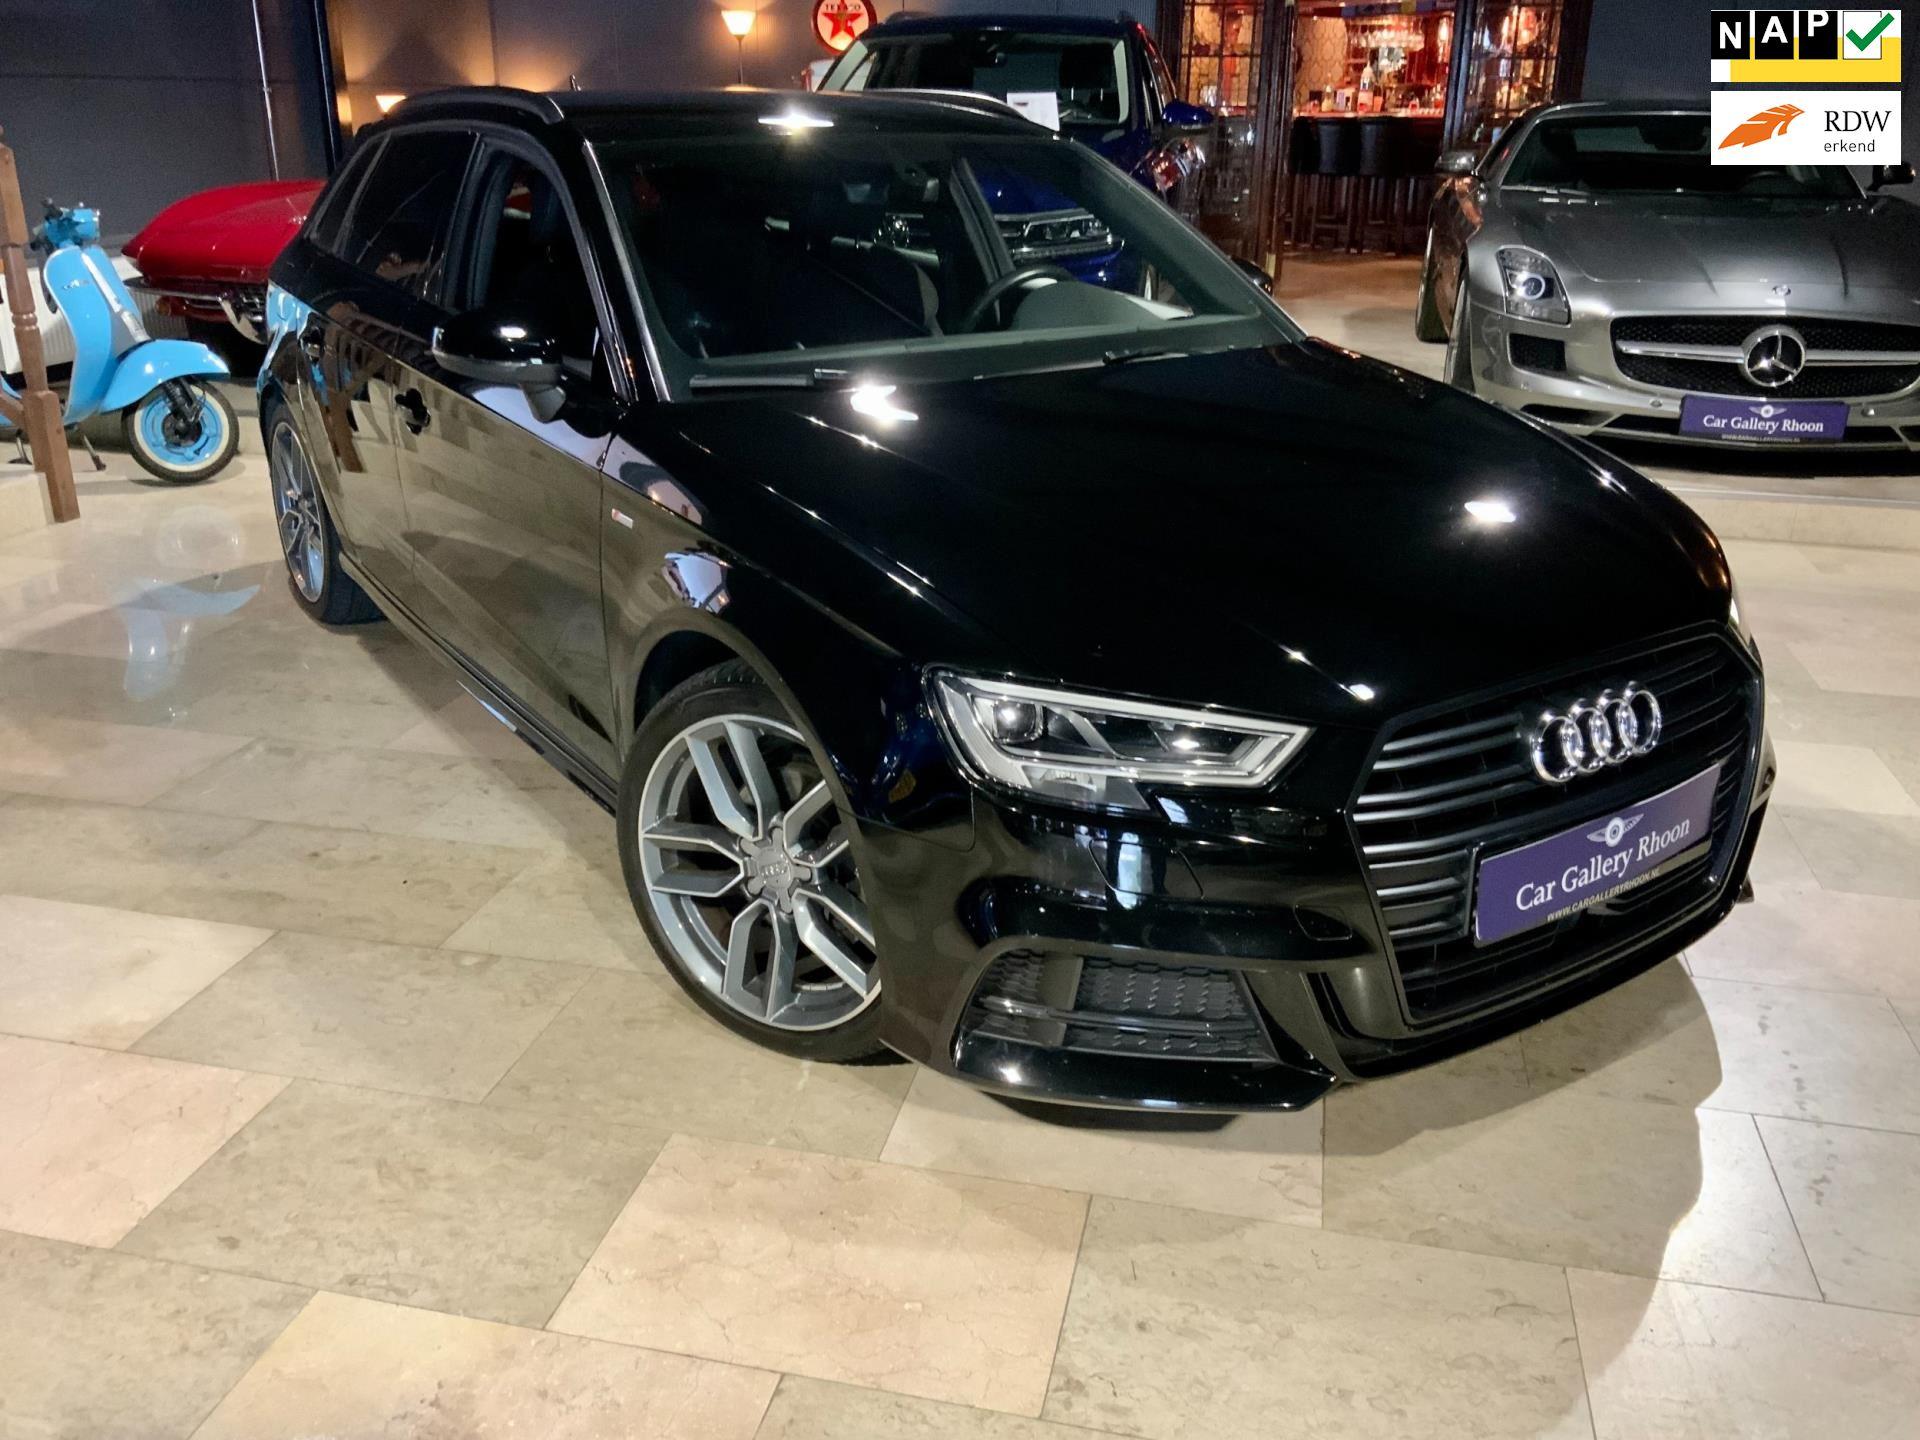 Audi A3 Sportback occasion - CarGalleryRhoon